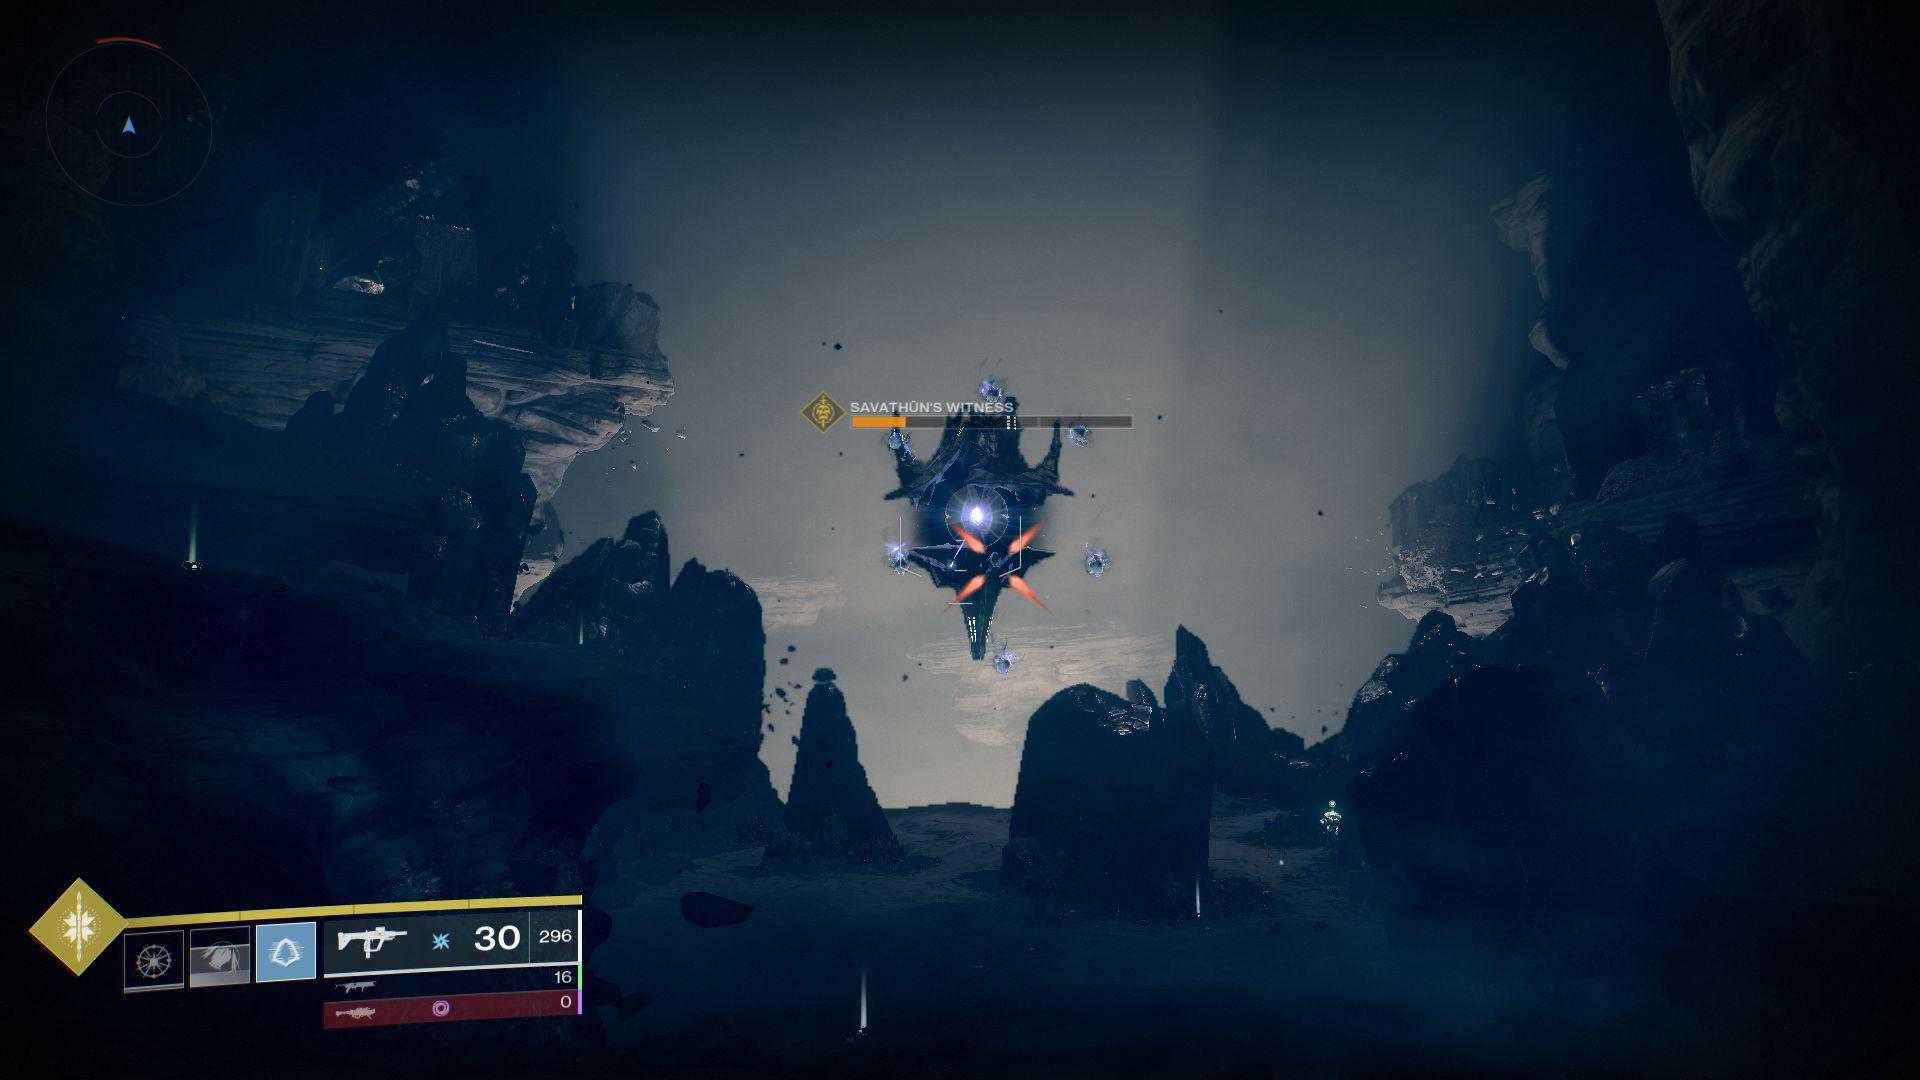 Image showing the Savathun Witness boss in Destiny 2.